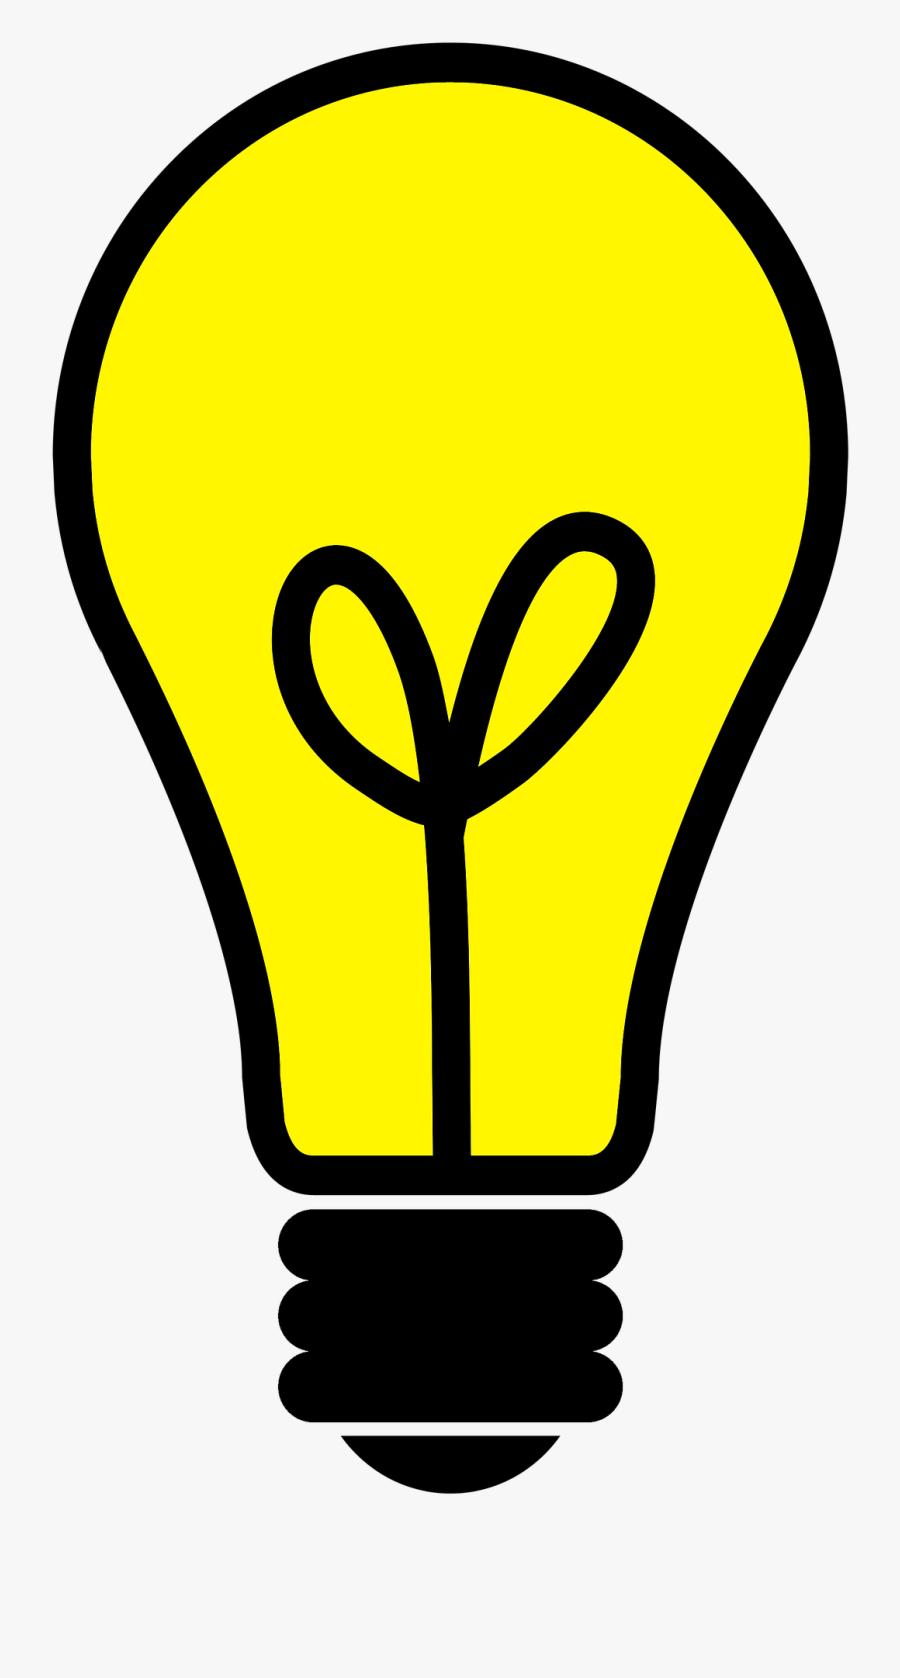 Light Bulb Png Transparent - Light Bulb Illustration Png, Transparent Clipart